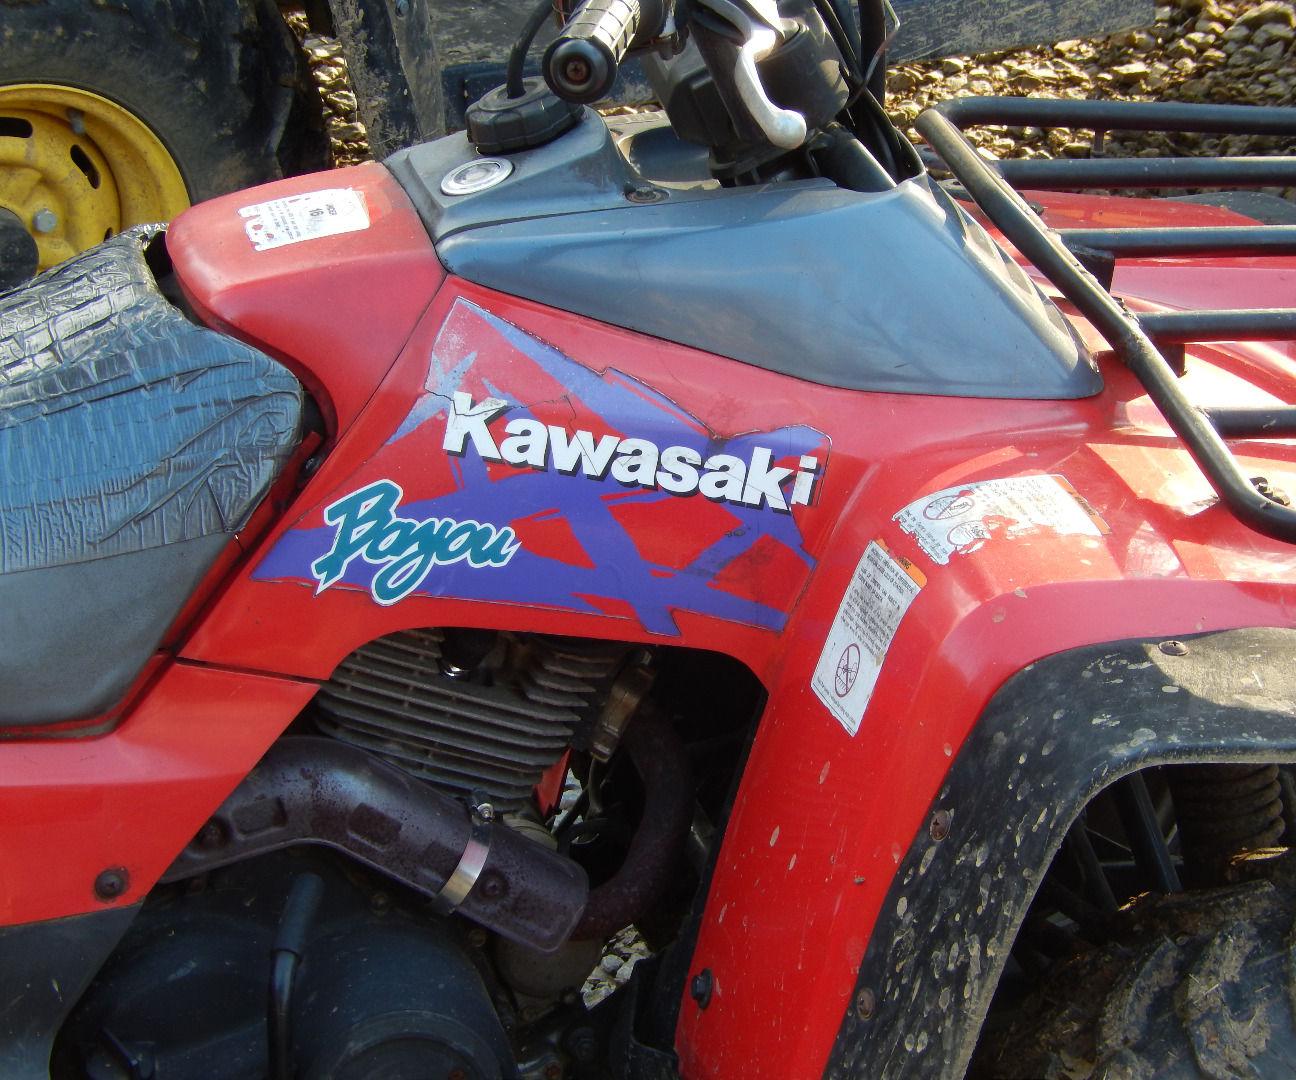 troubleshooting repairing a kawasaki bayou klf300 atv electrical charging system [ 1296 x 1080 Pixel ]